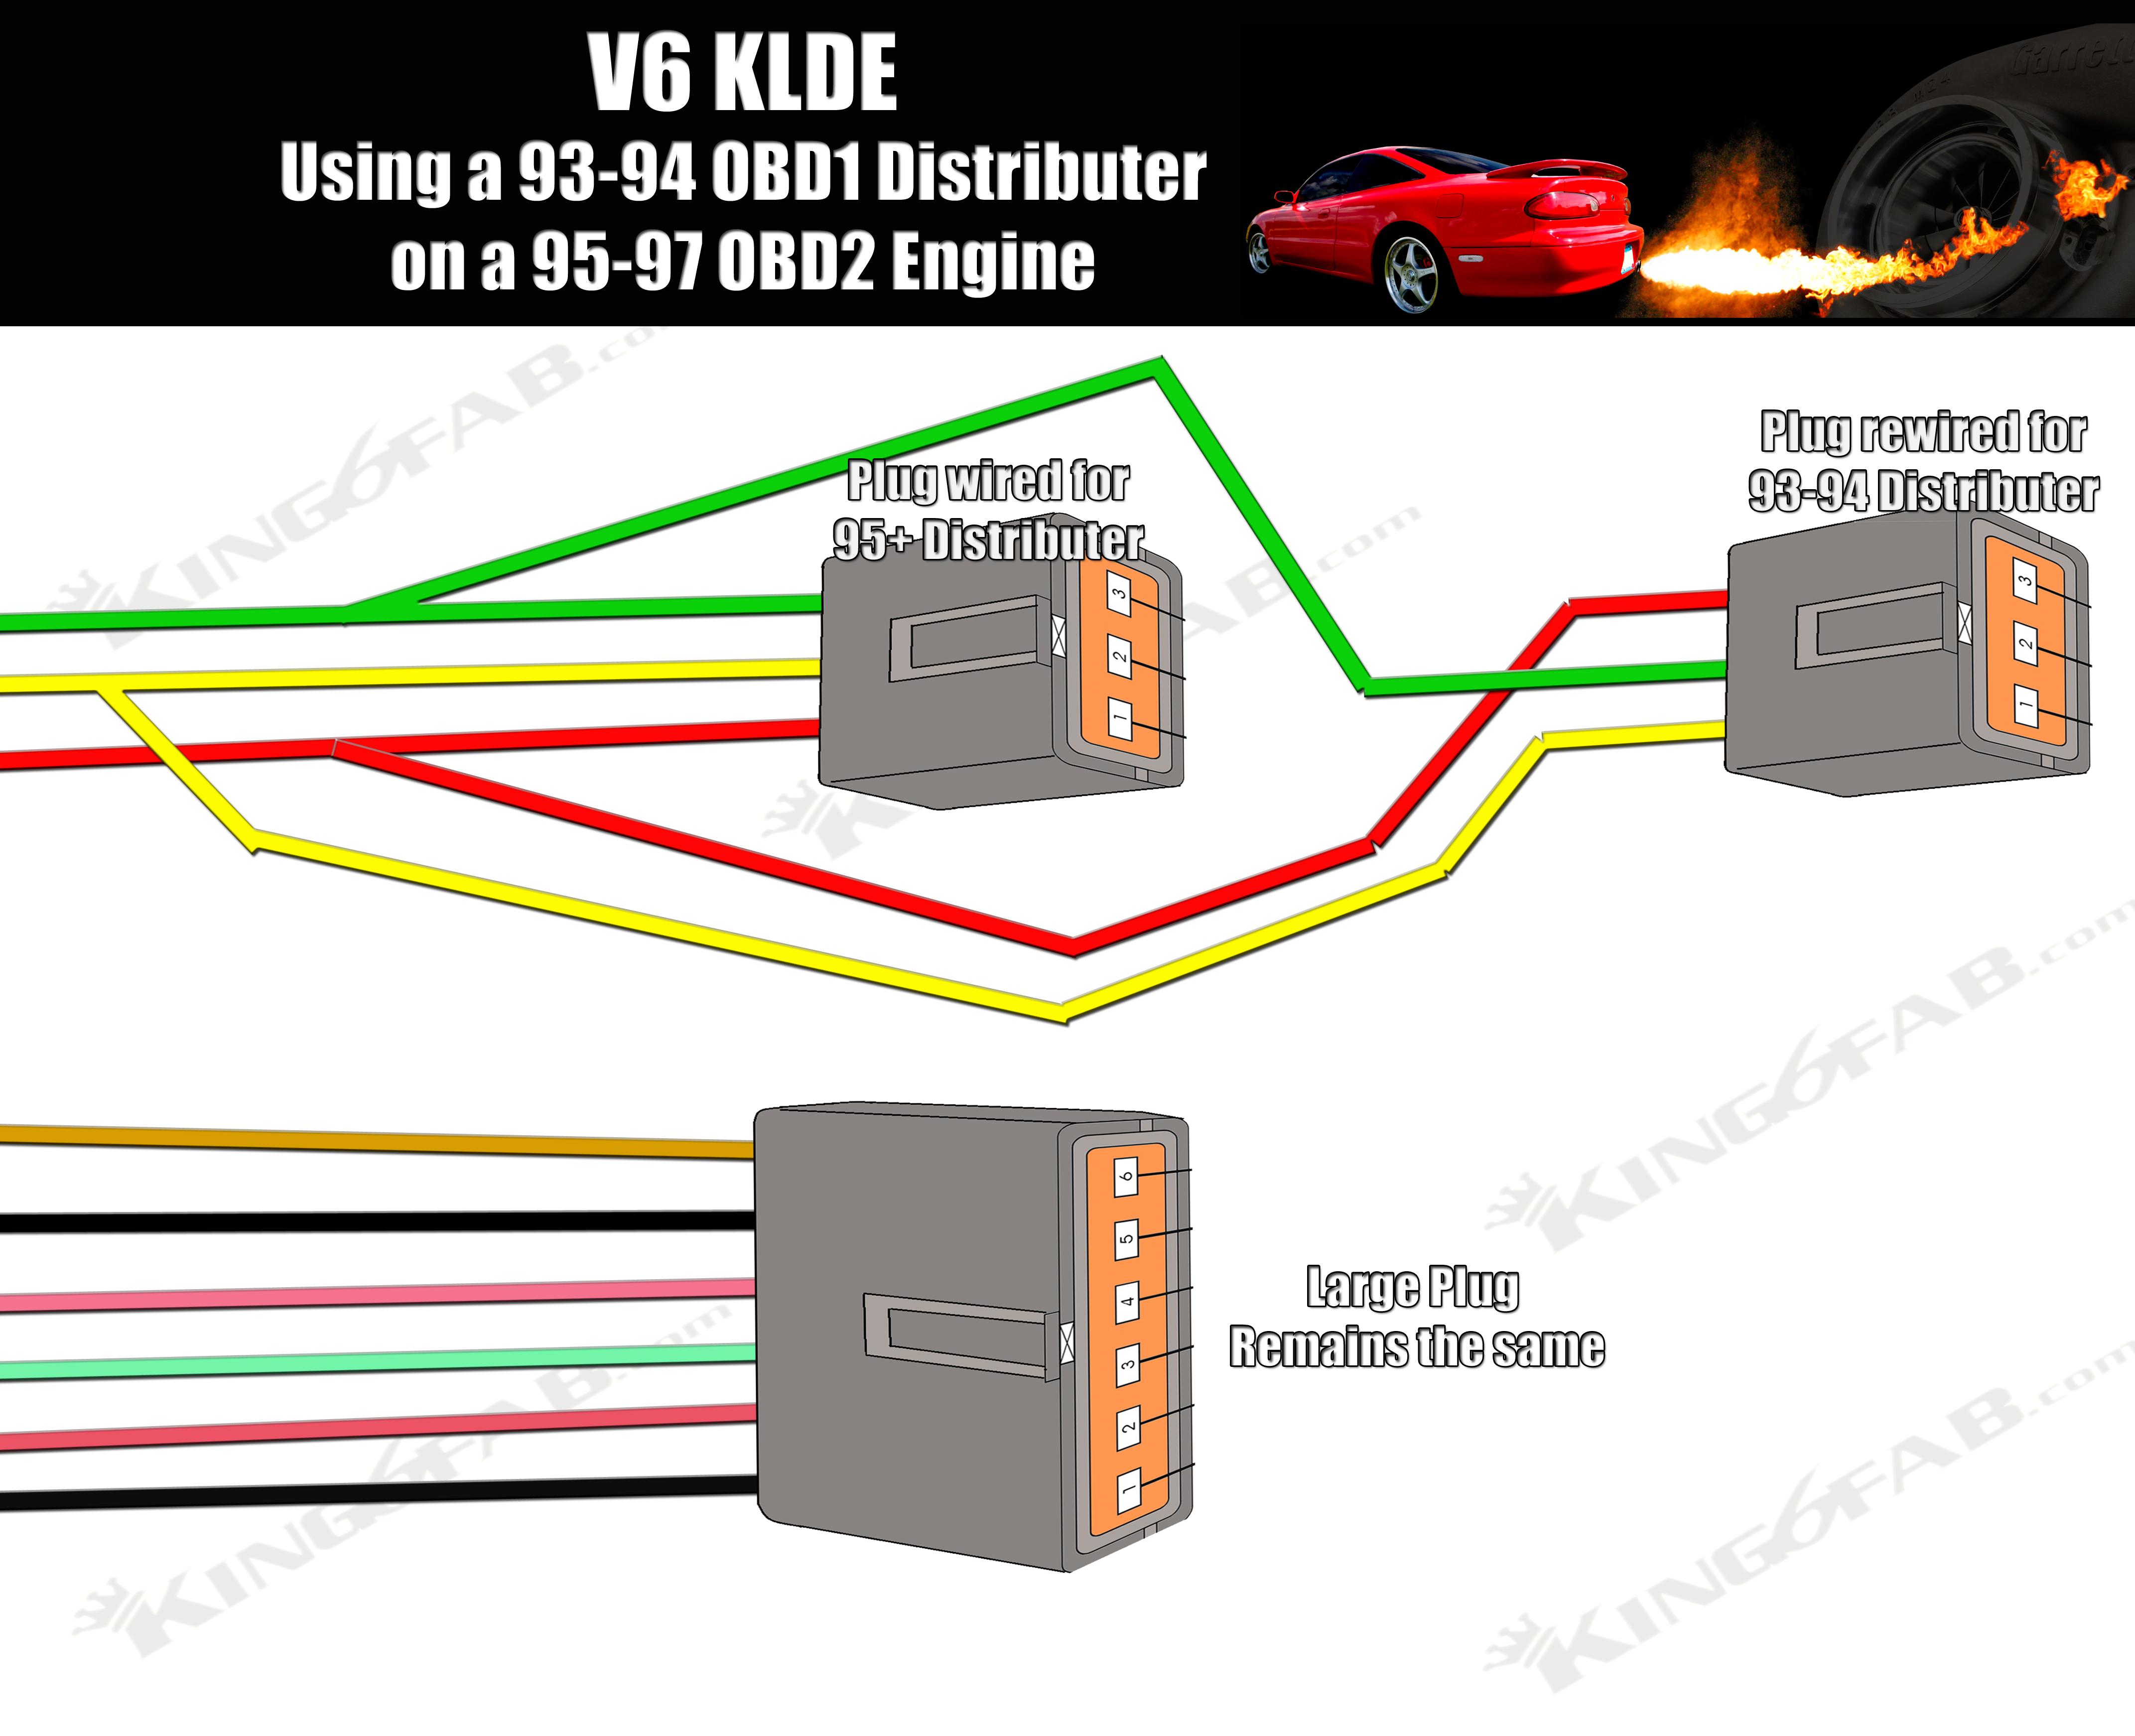 1997 mazda mx6 wiring schematic 93 94 to 95 distributor conversion     welcome to king6fab  93 94 to 95 distributor conversion